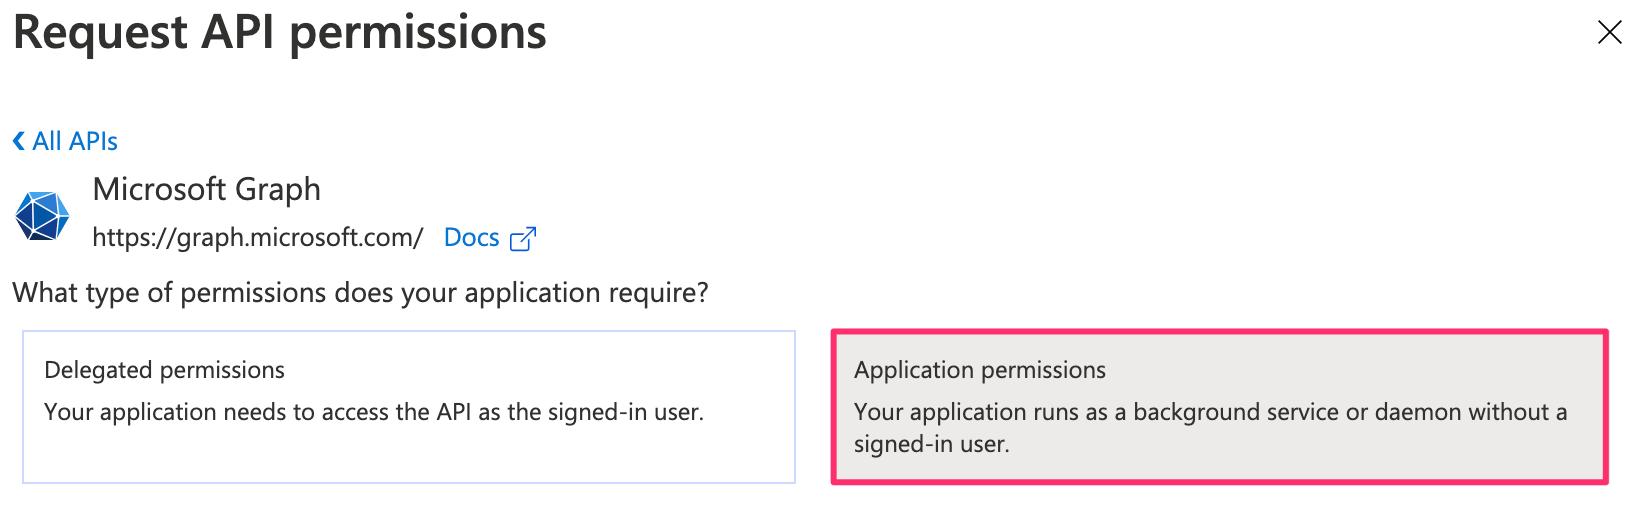 Request_API_permissions_-_Azure_Active_Directory_admin_center222.png